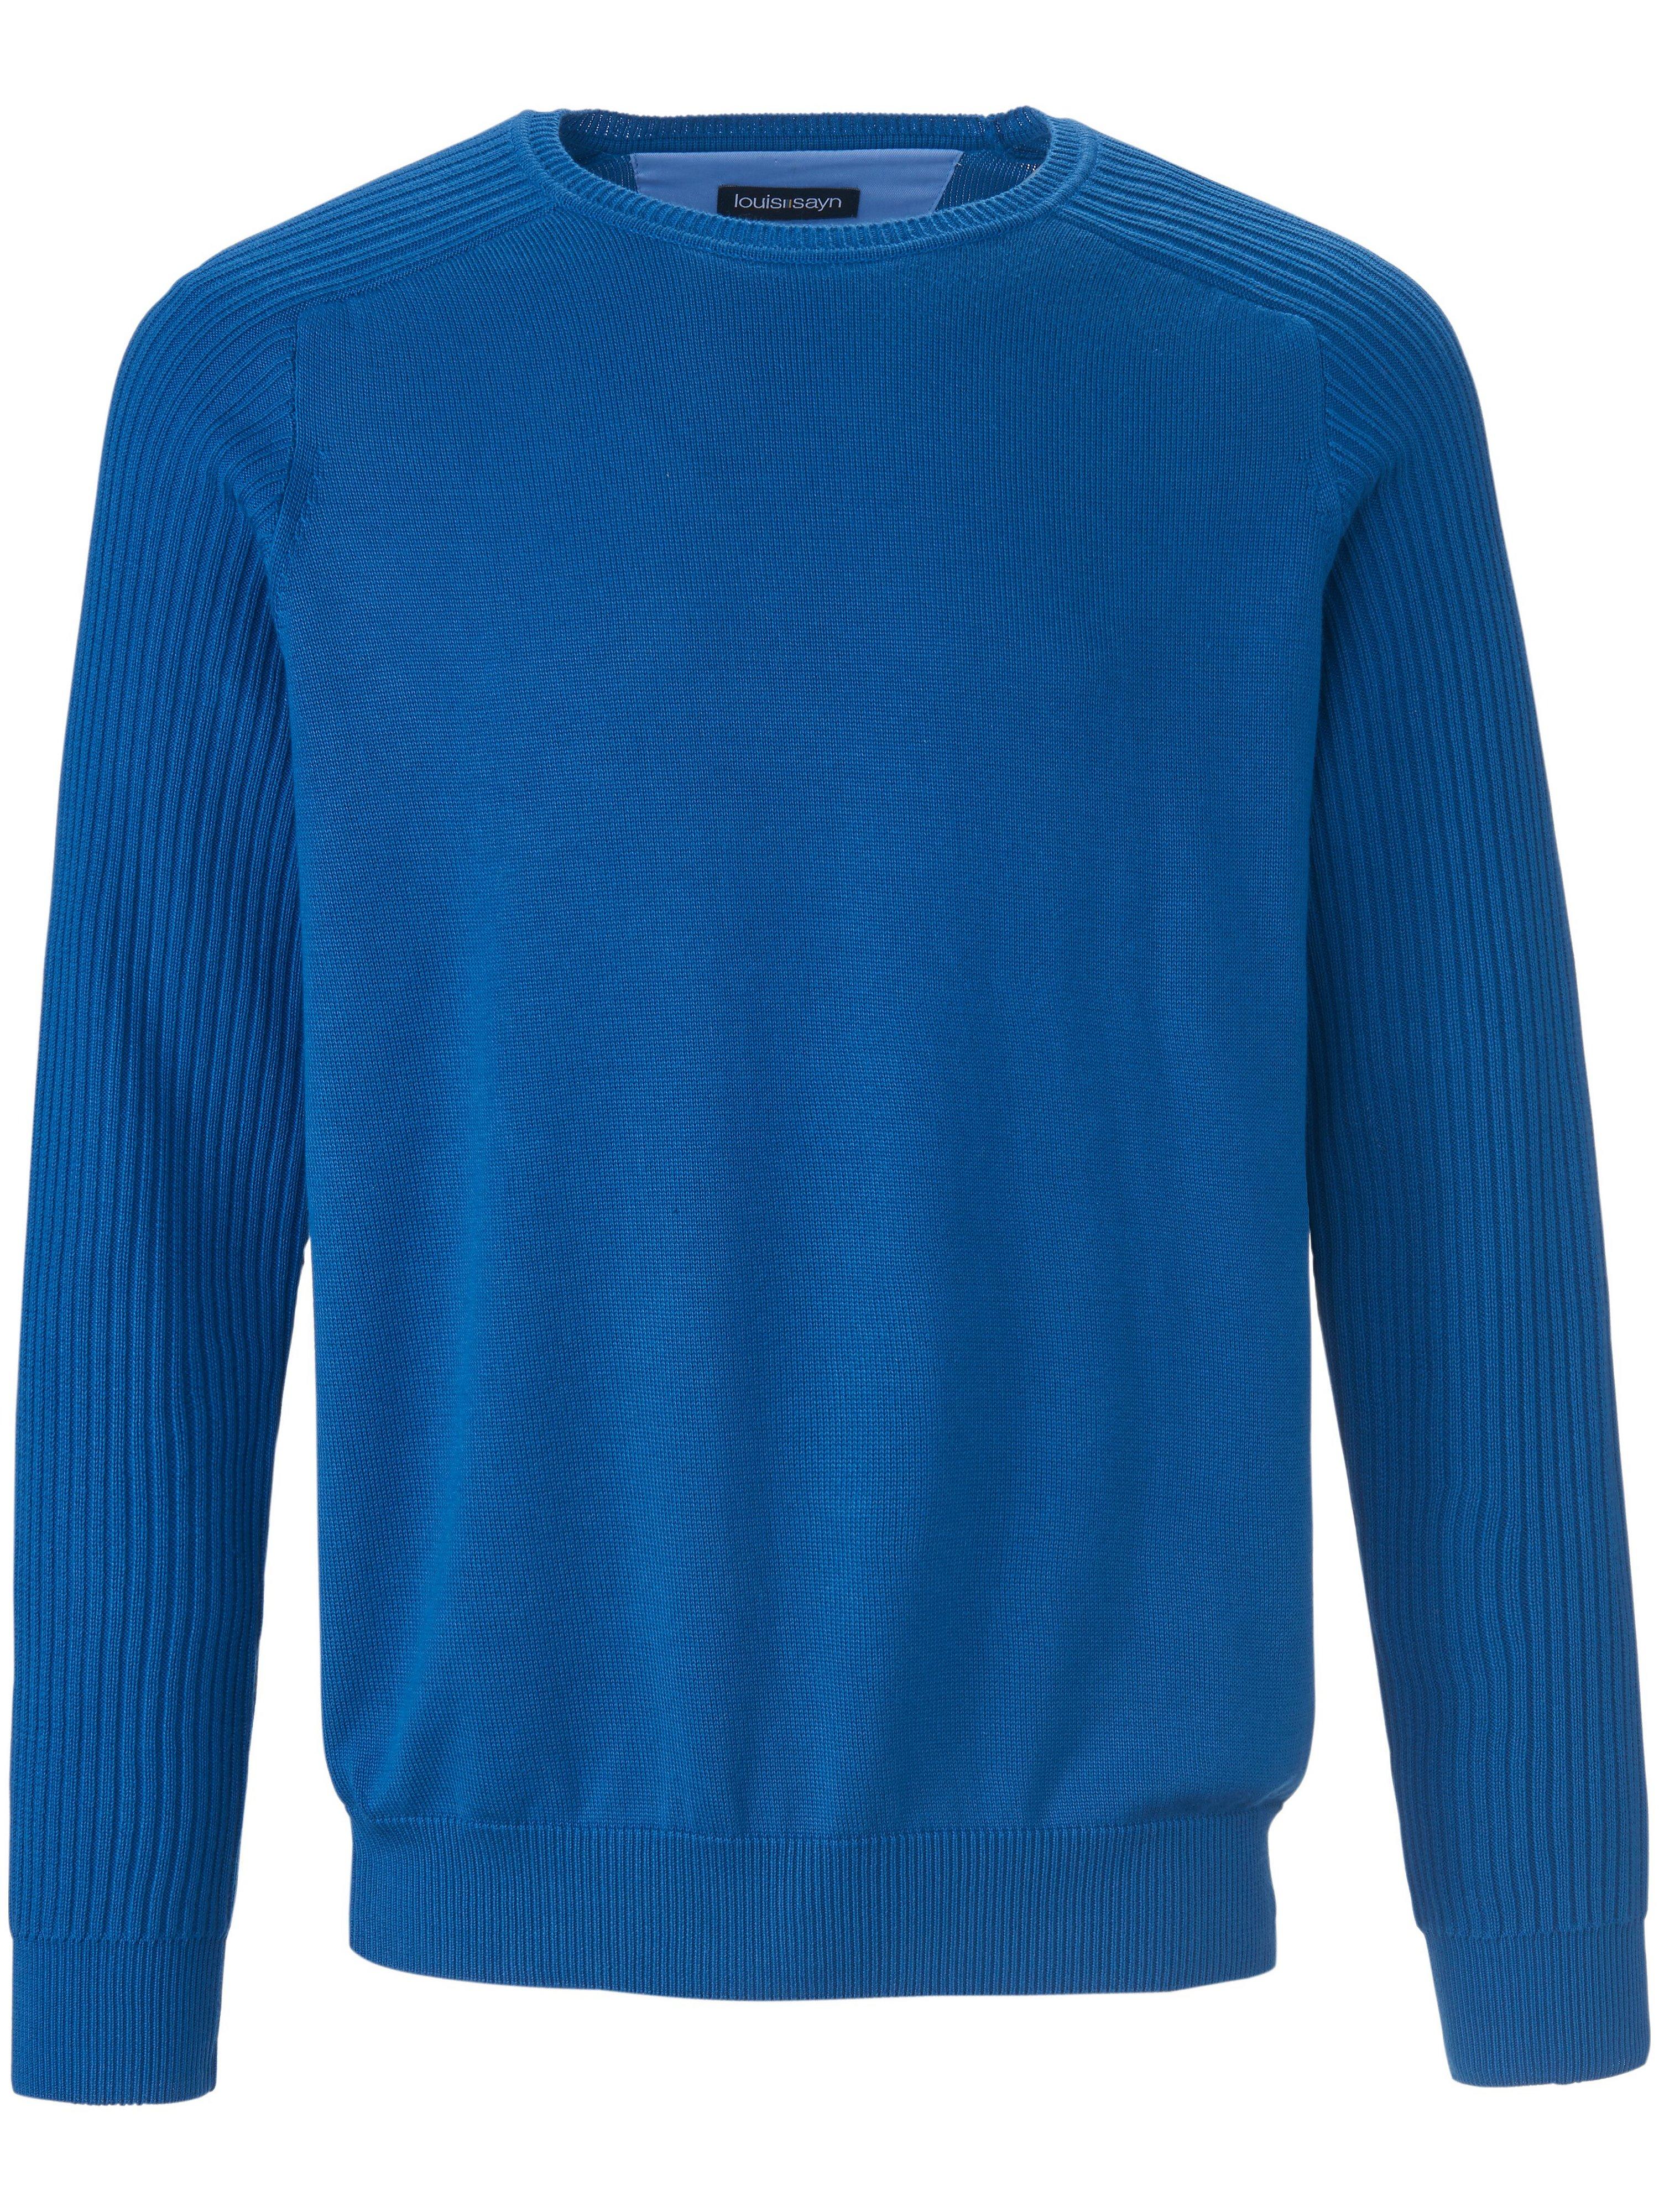 Le pull 100% coton  Louis Sayn bleu taille 50